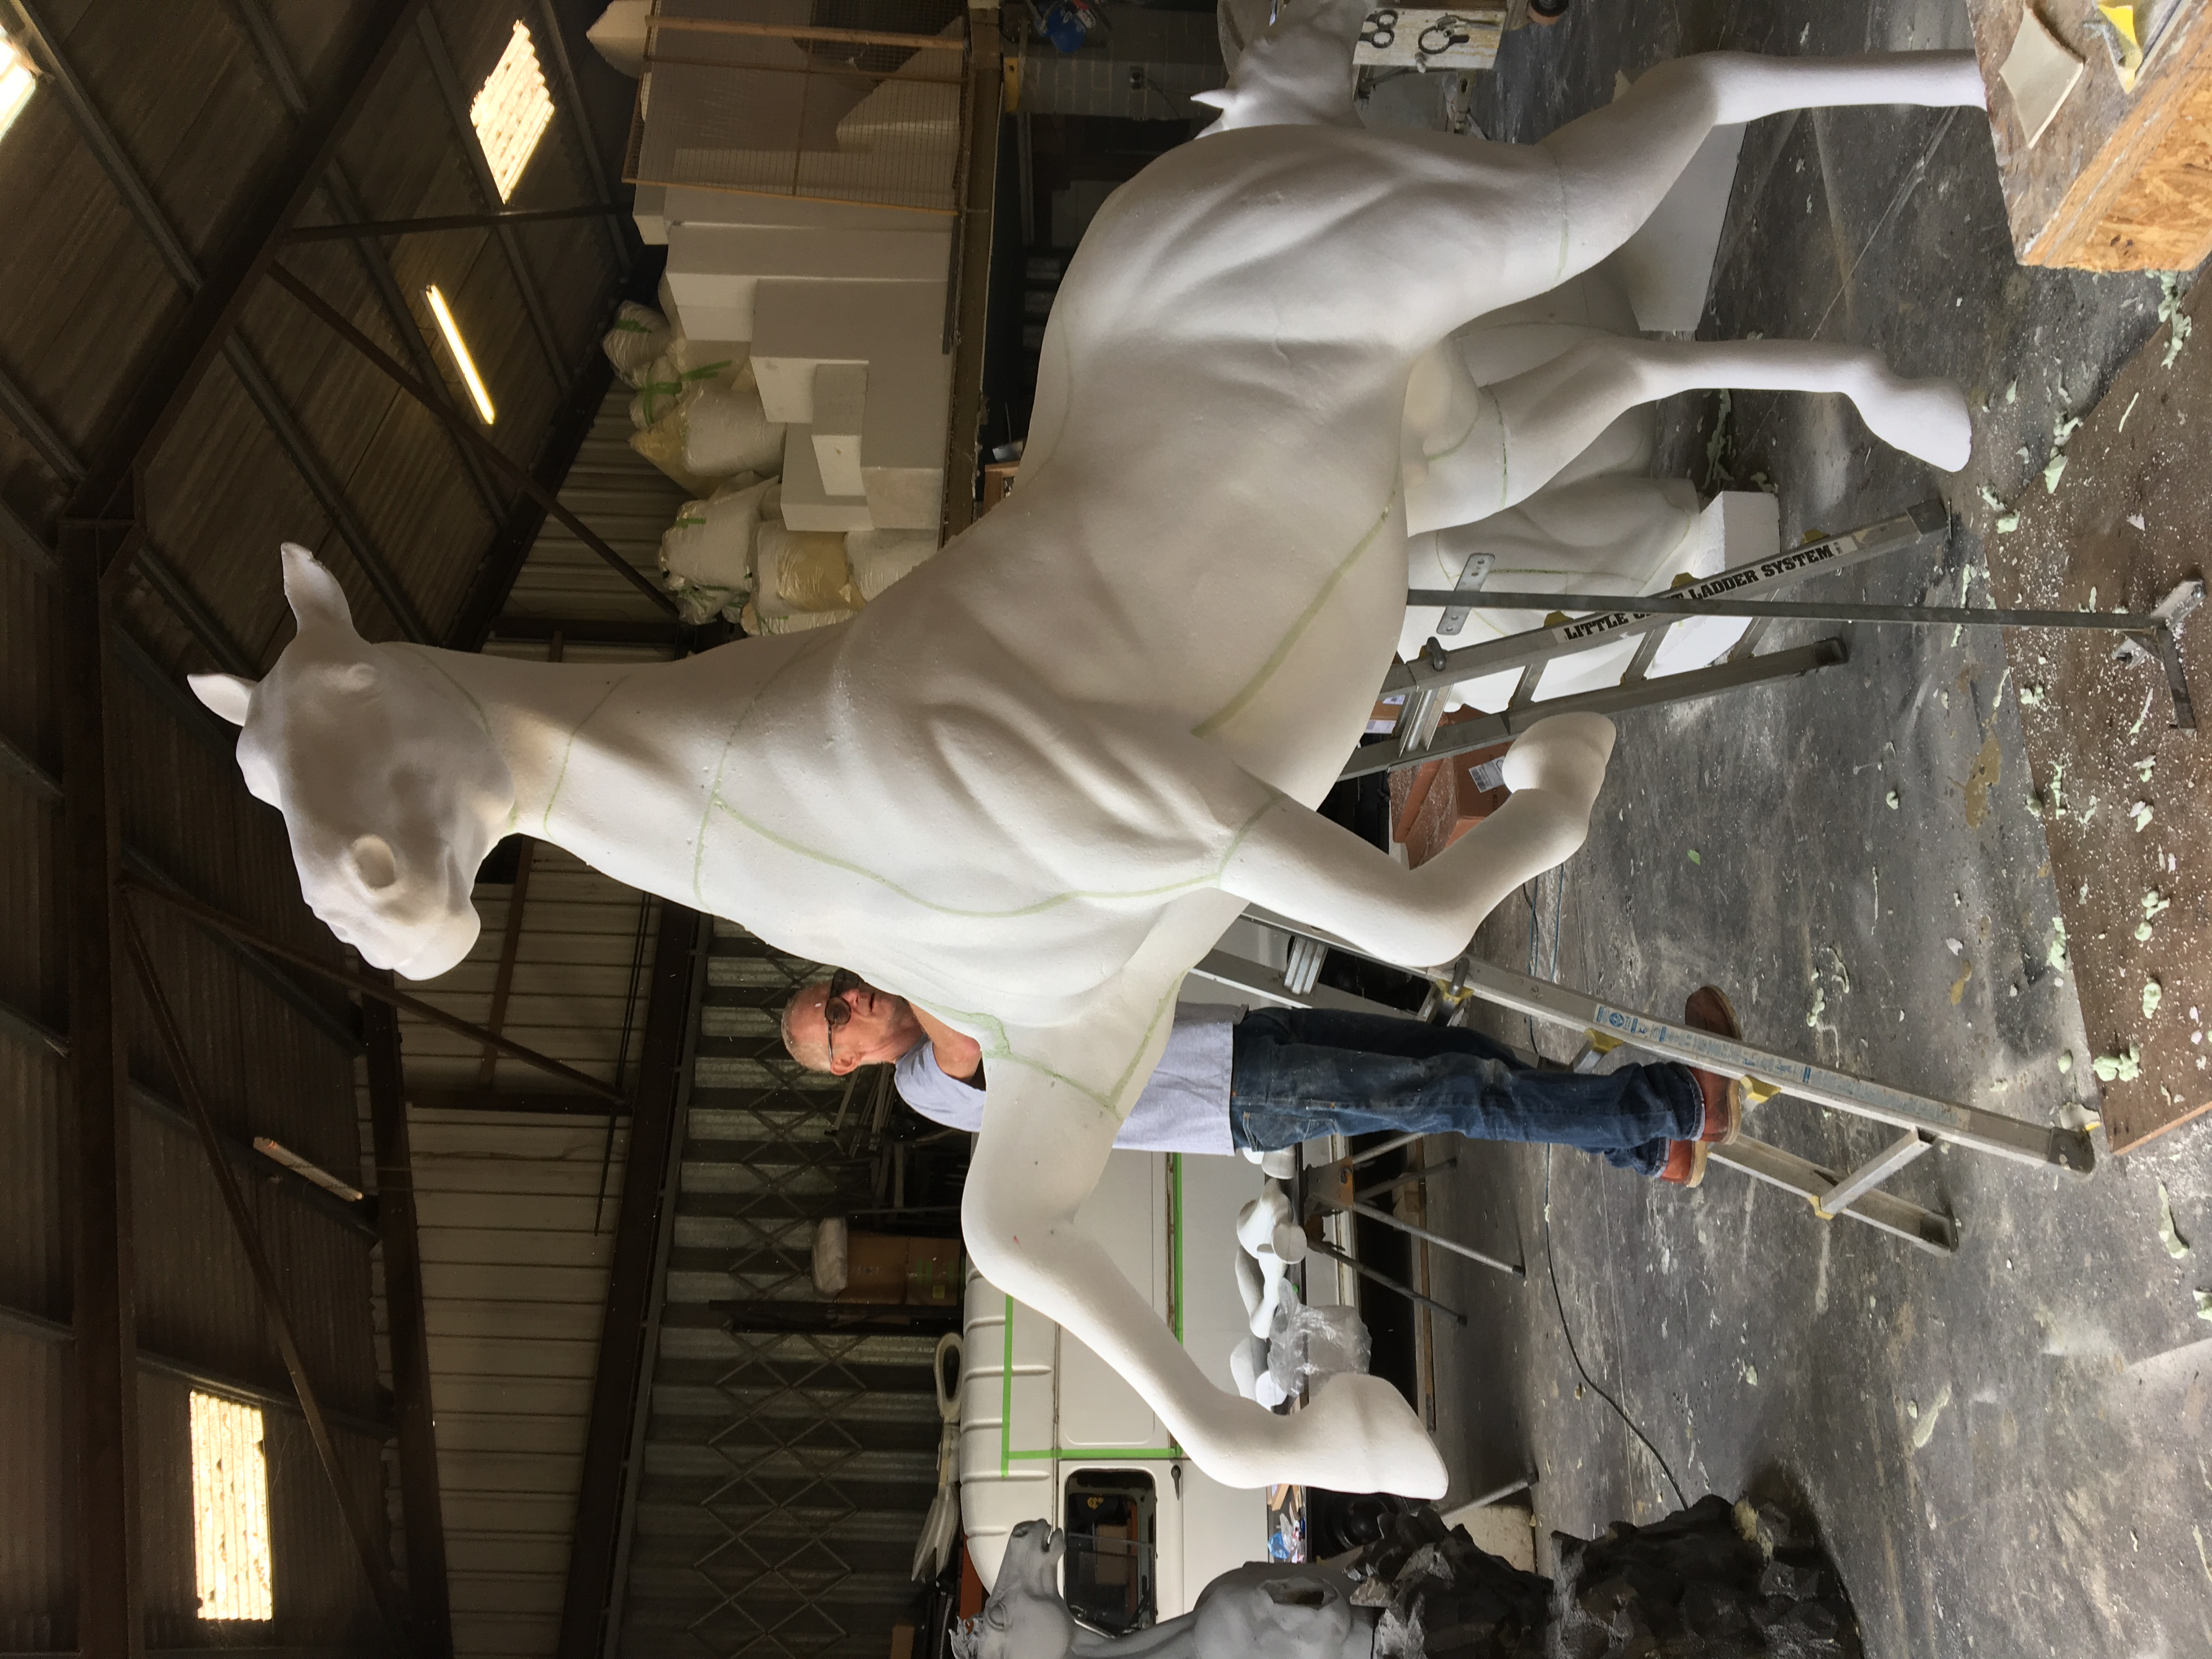 Horse model assembly/finishing